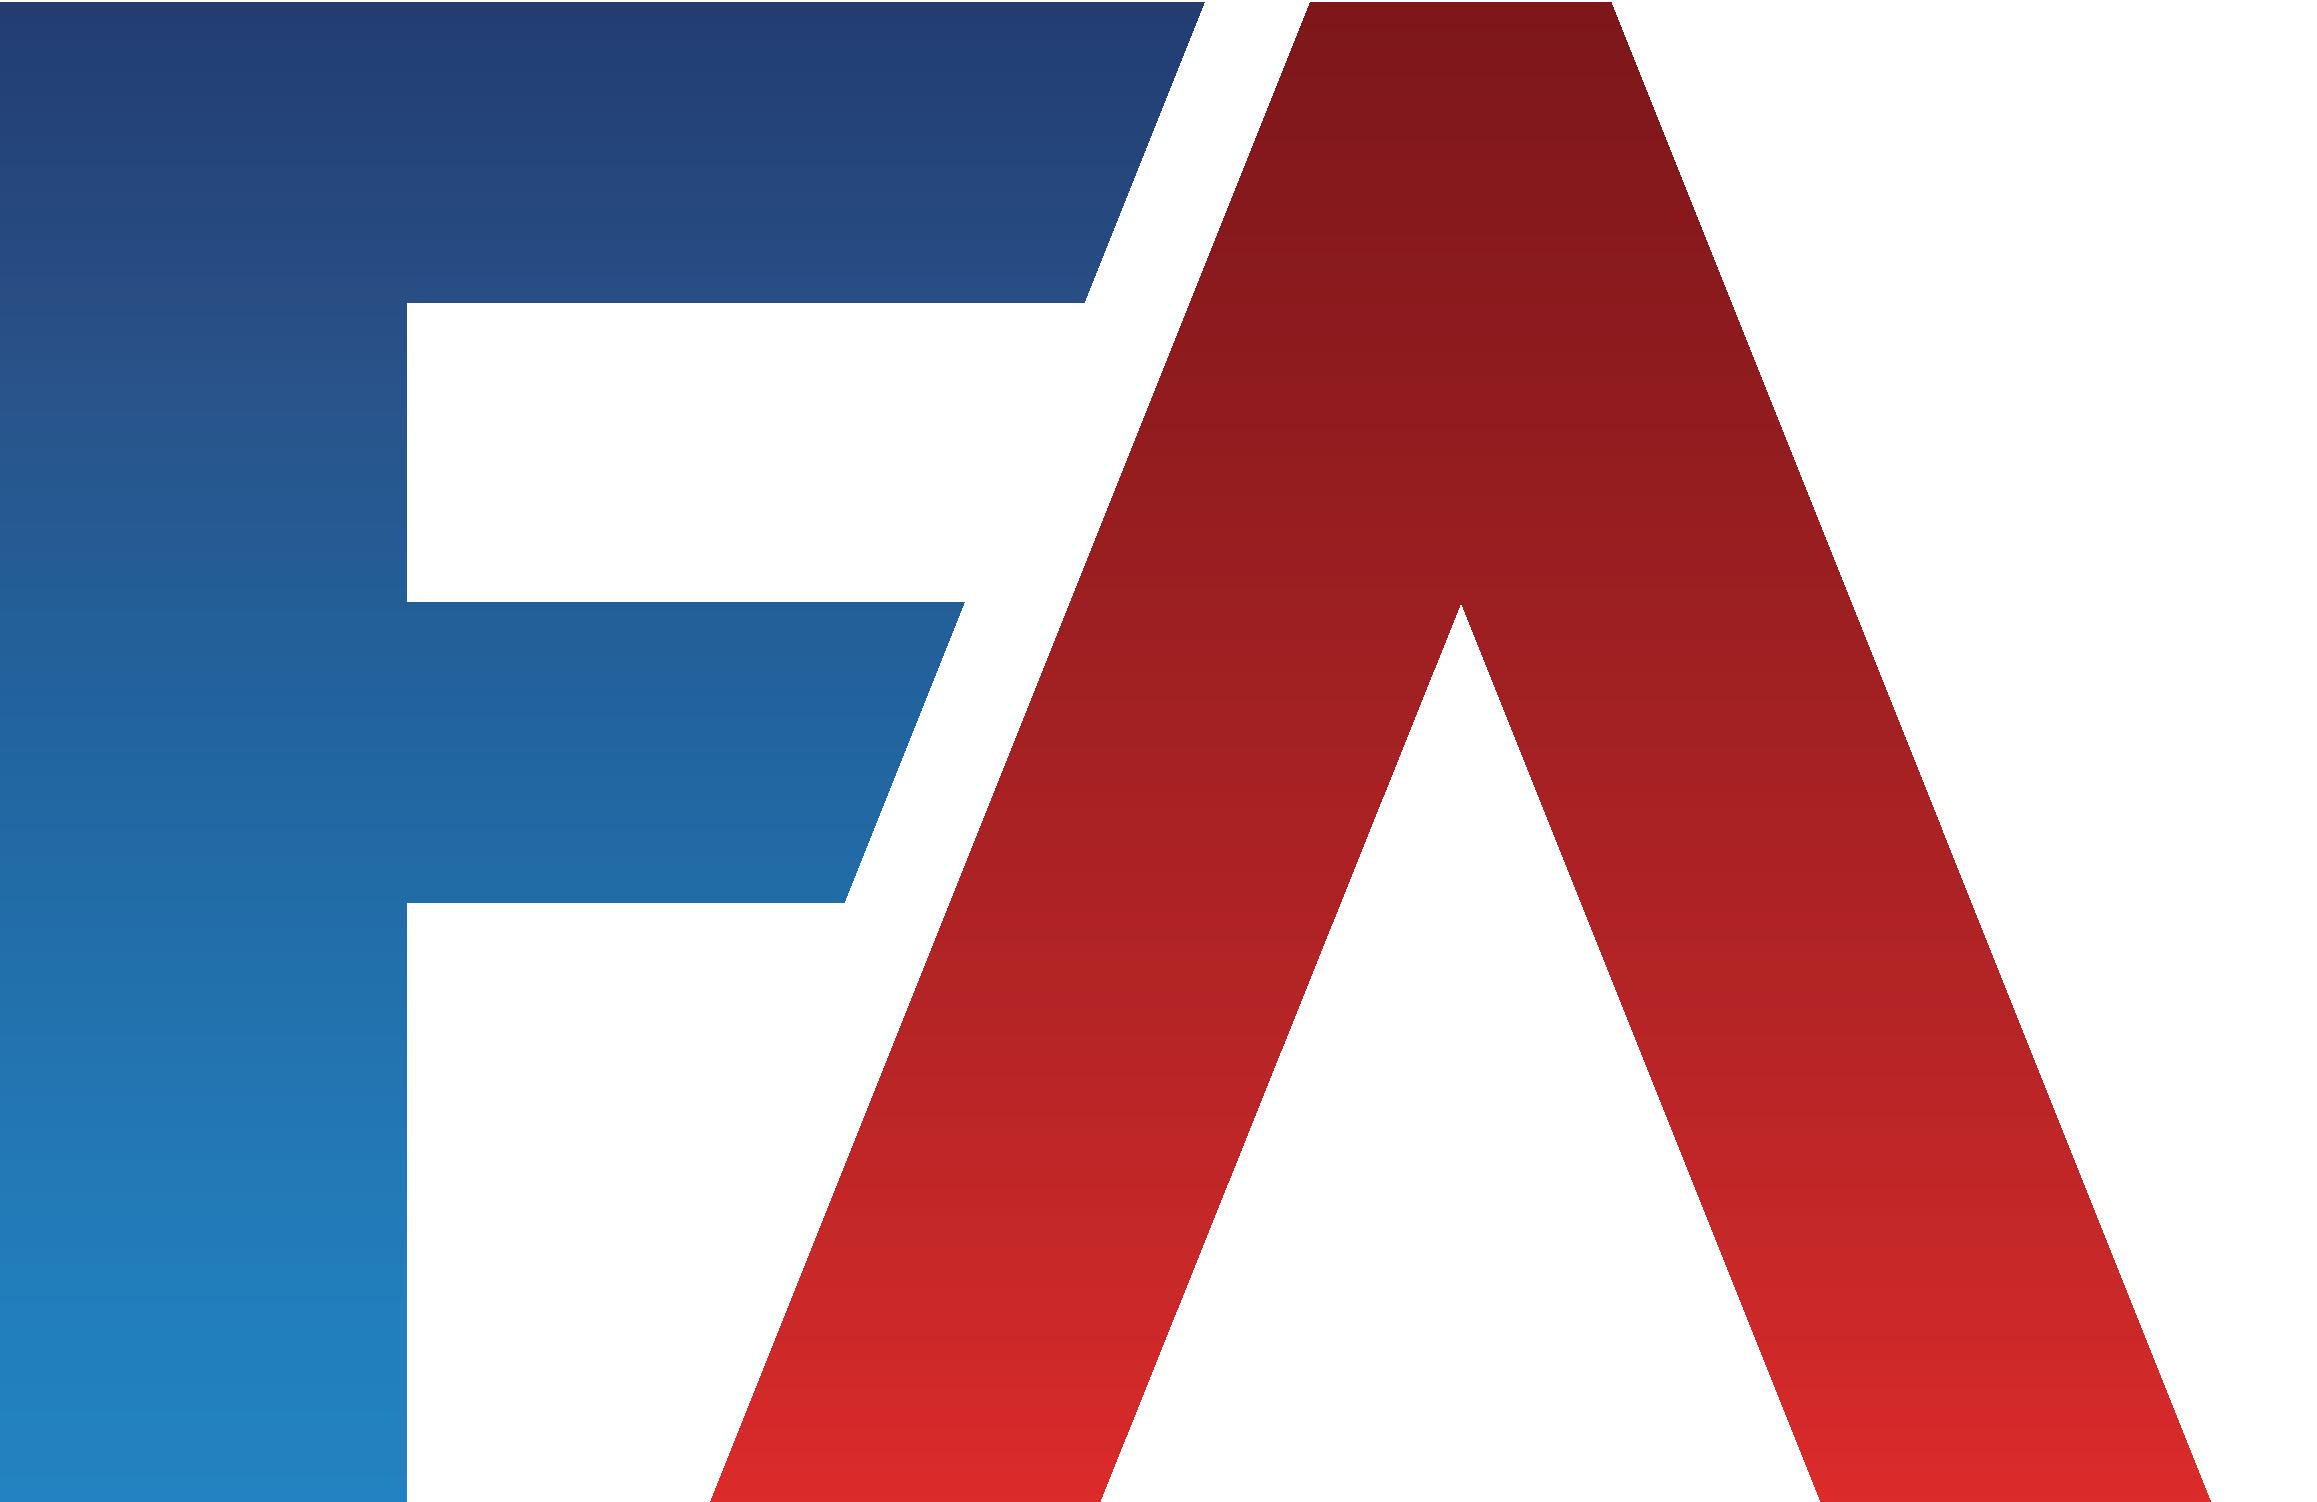 Andrelton Simmons - SS | FantasyAlarm.com